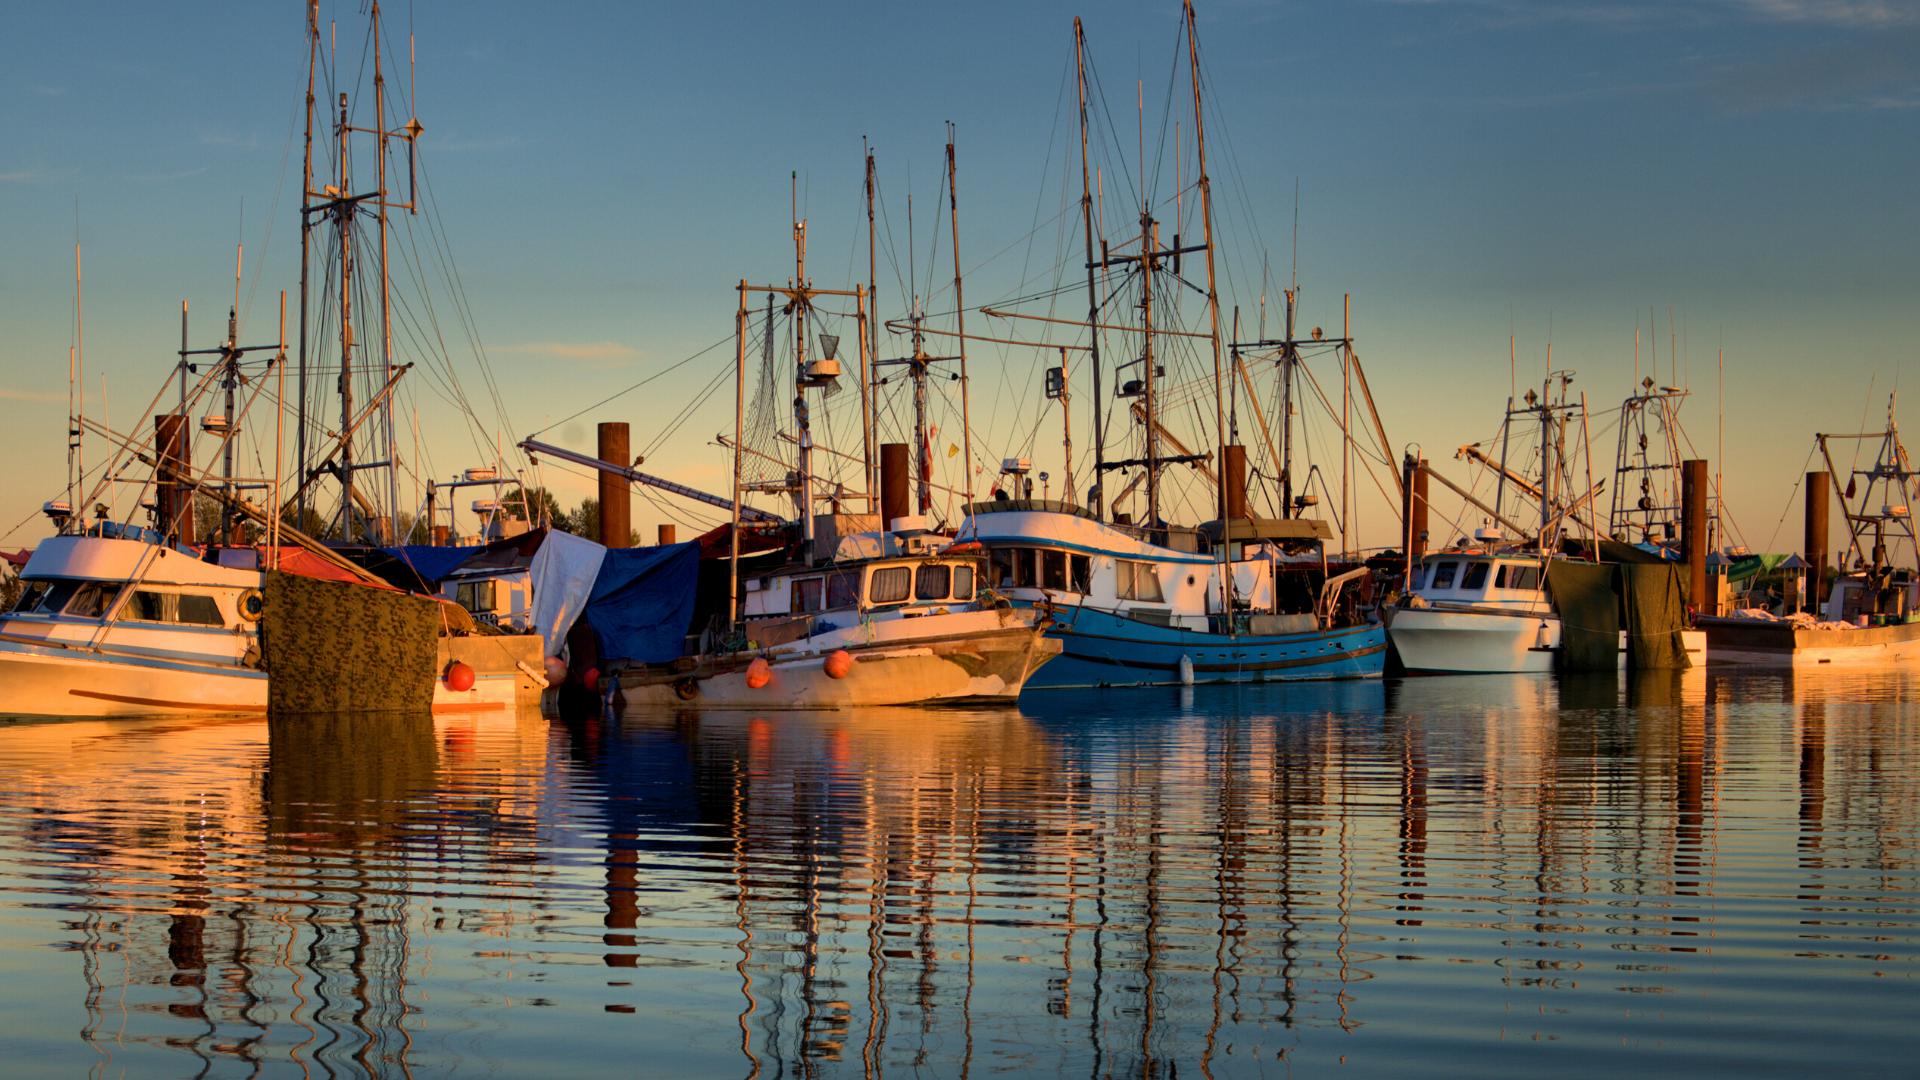 Grassy Sound Marina - Posts | Facebook |Grassy Sound Marina Fishing Pier